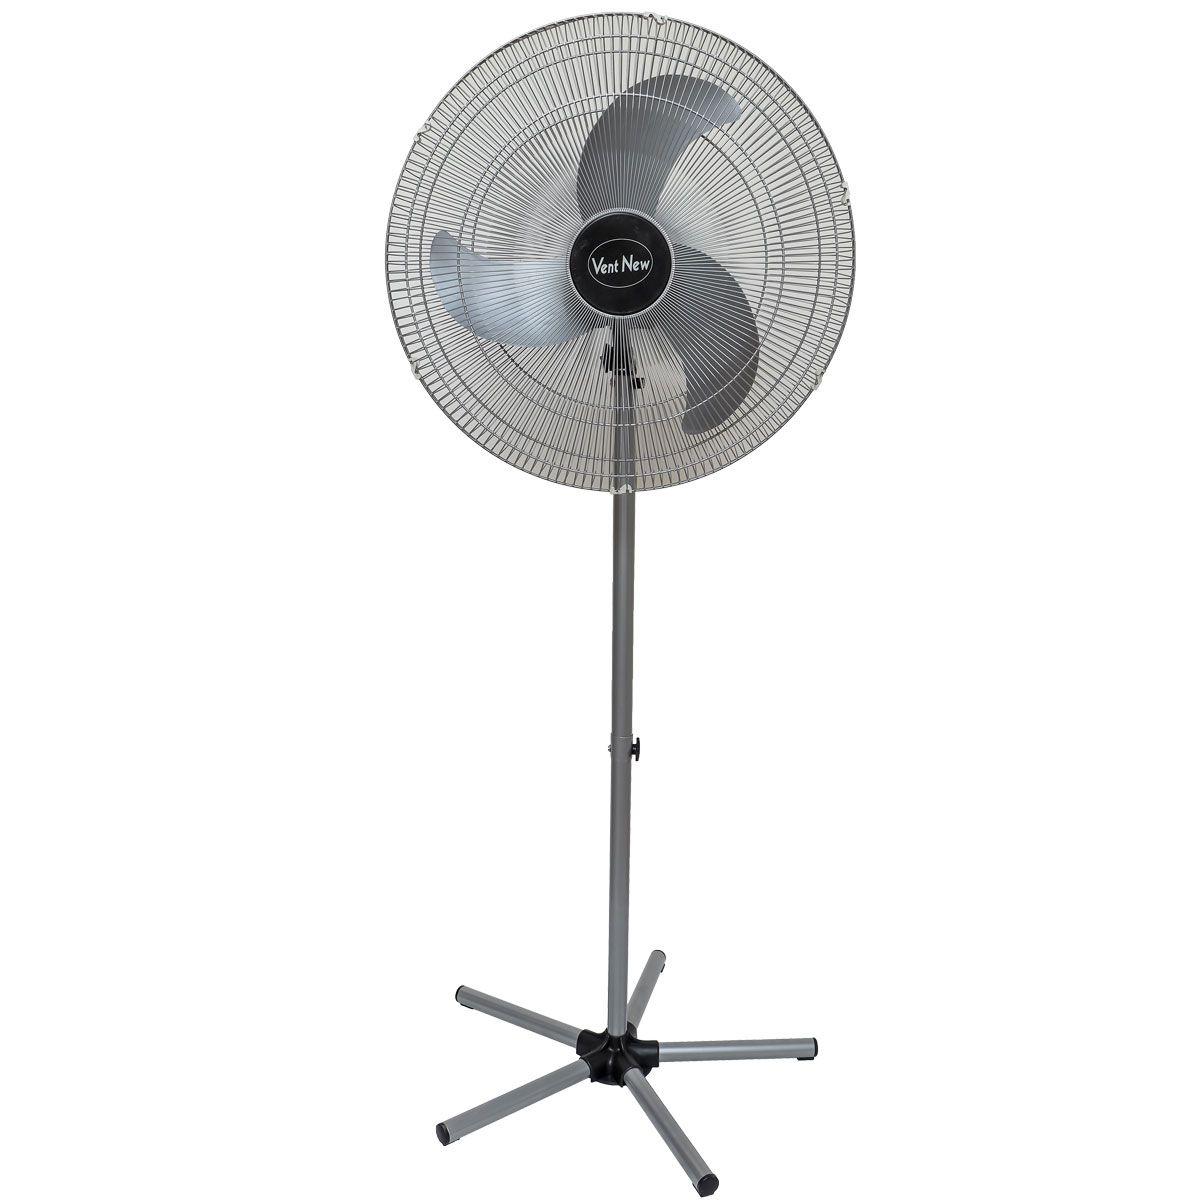 Ventilador De Coluna Oscilante 60 Cm Prata Bivolt